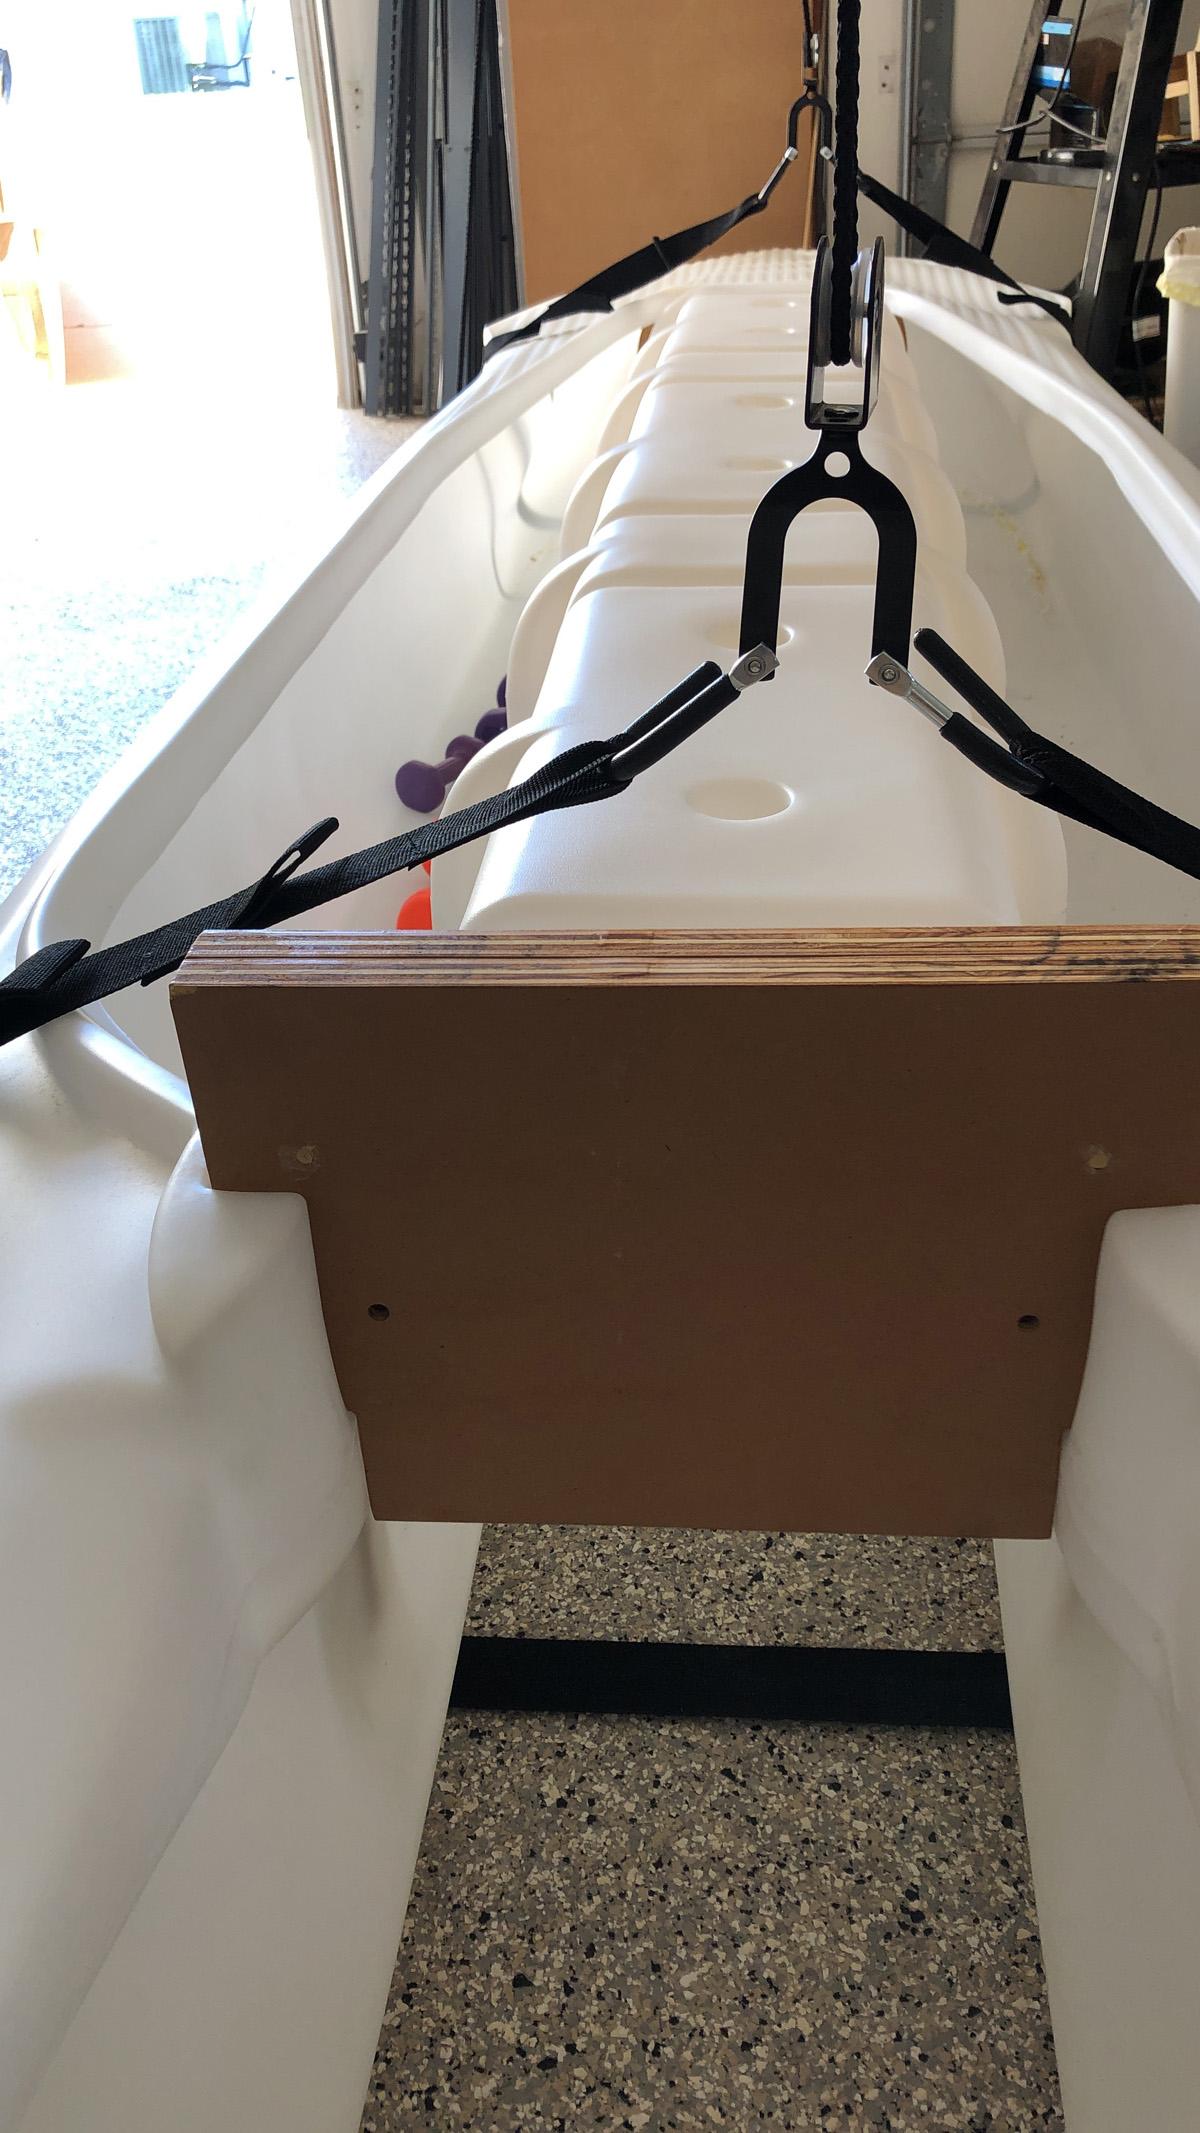 ceiling sling storage system for S4 motor kayak microskiff